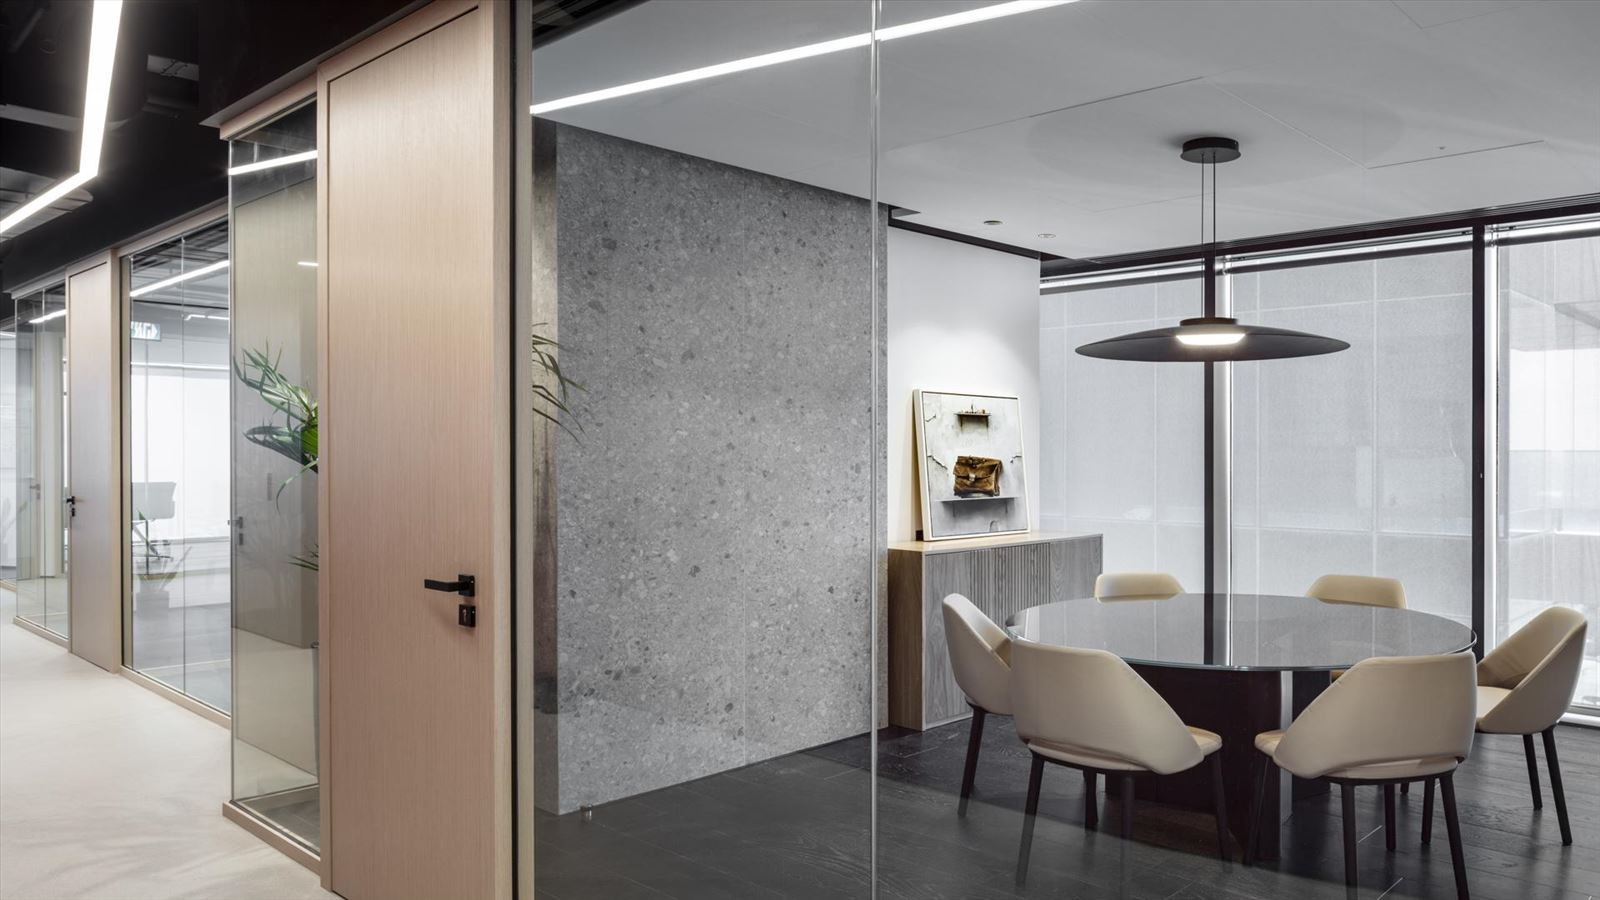 Fortissimo Offices – Tel Aviv חדר ישיבה קטן בגוף תאורה בעיצובו של דורי קמחי